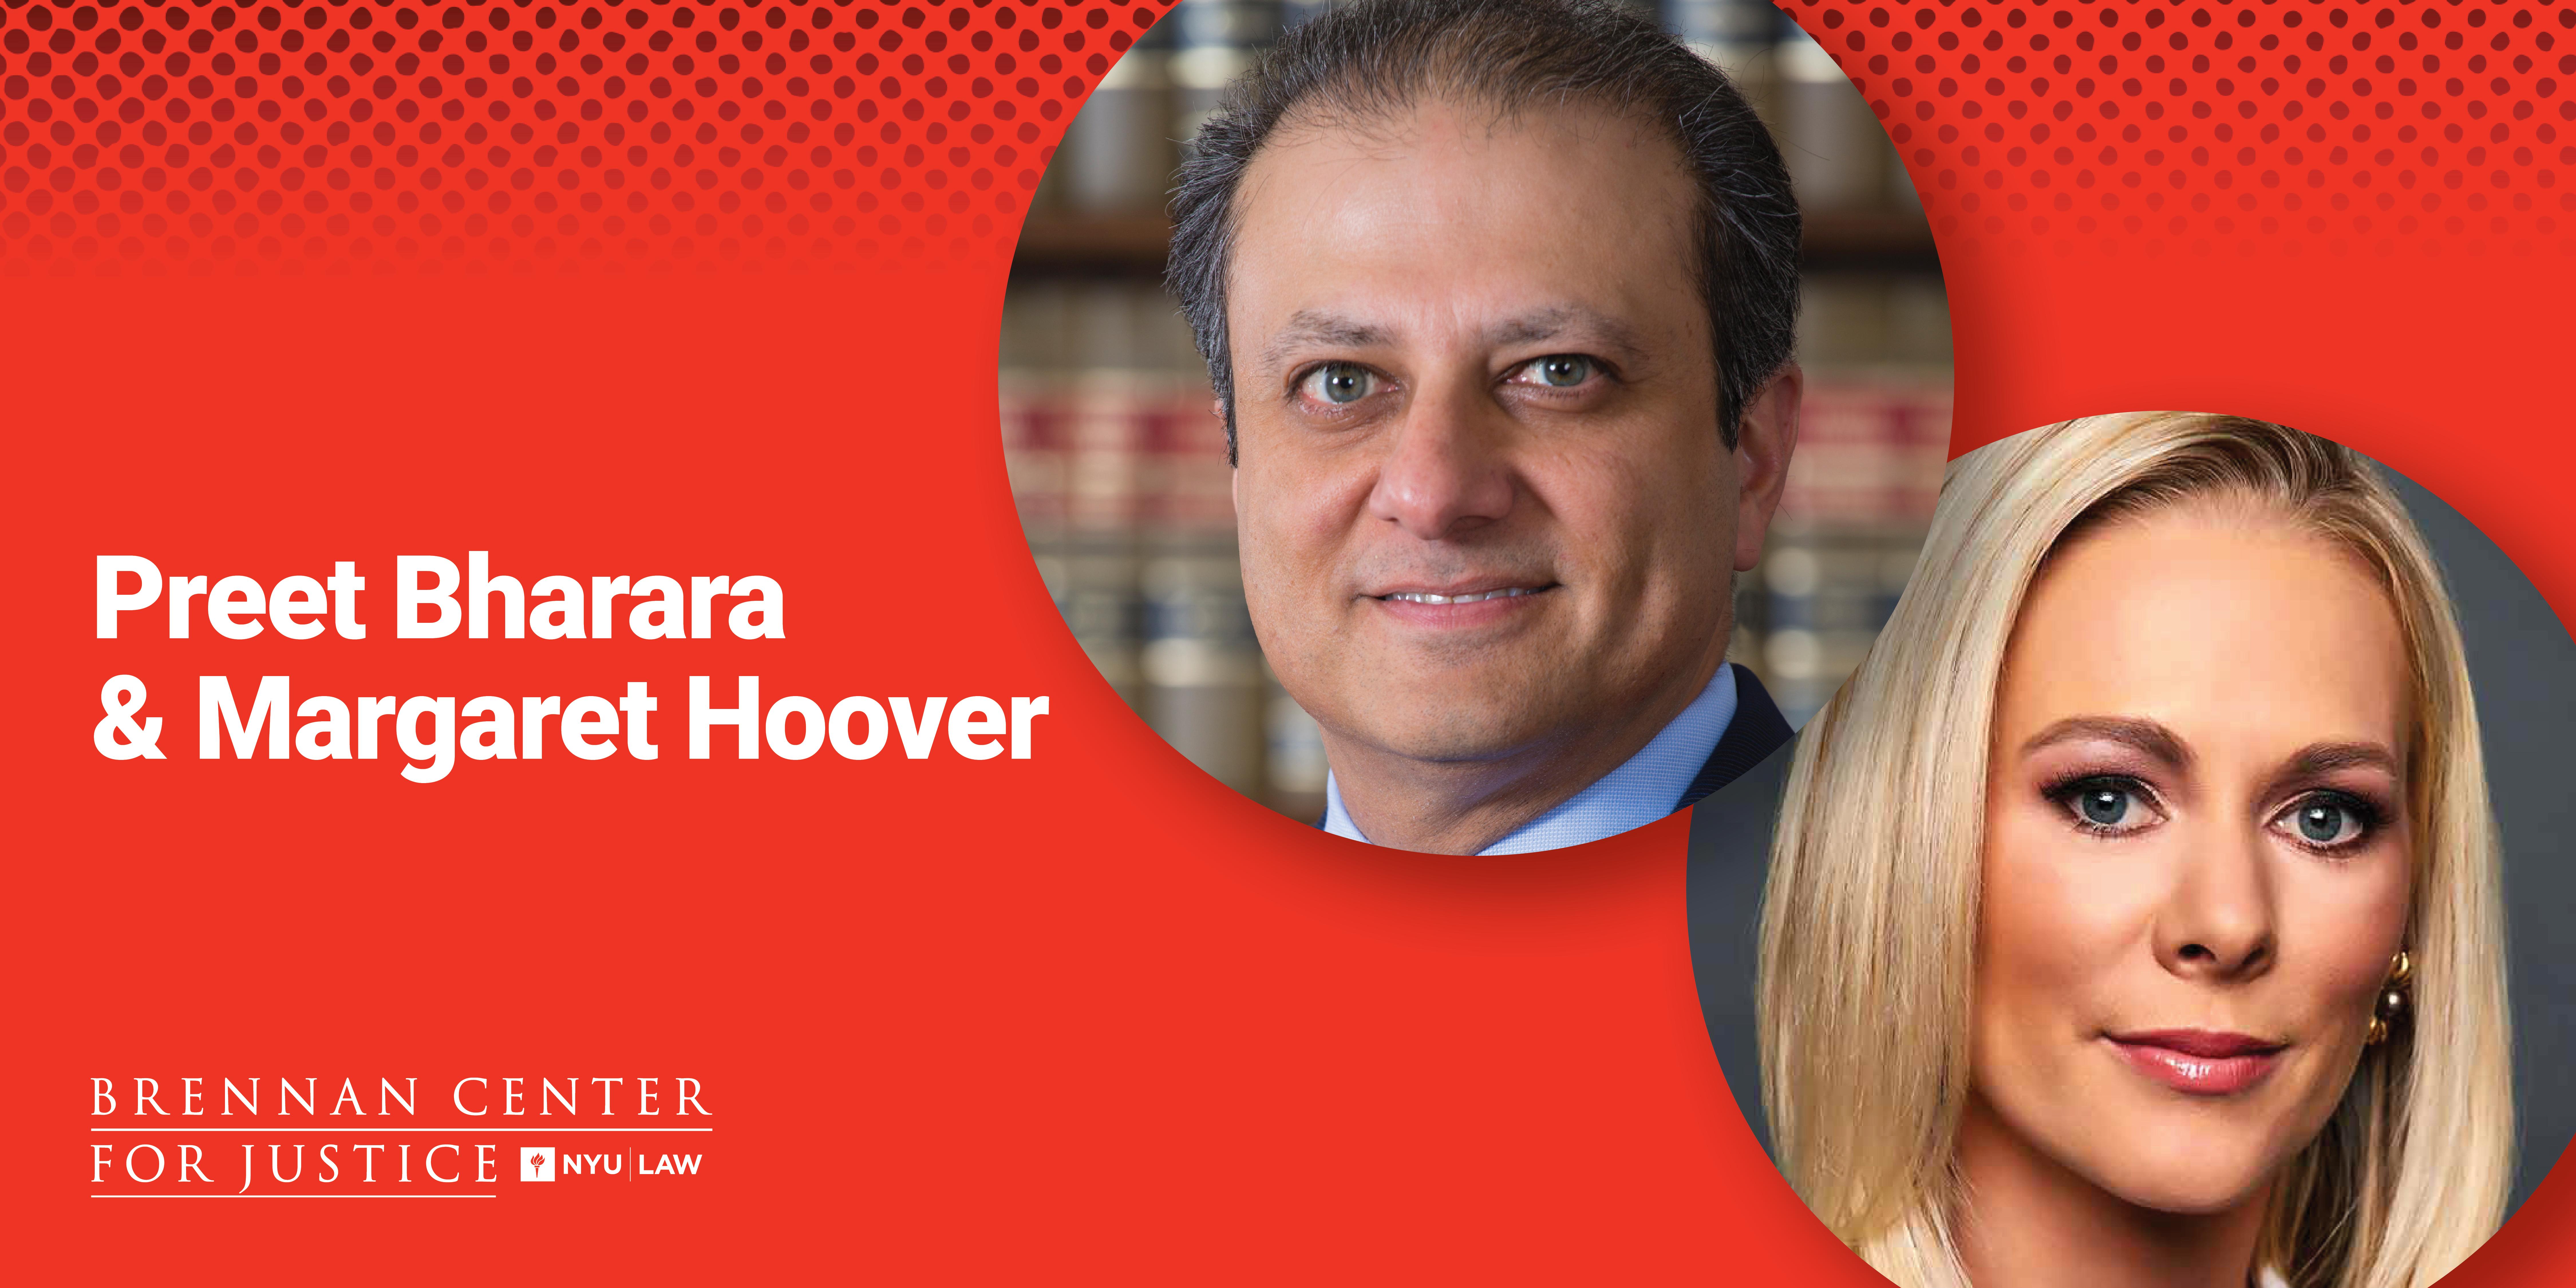 Preet Bharara and Margaret Hoover